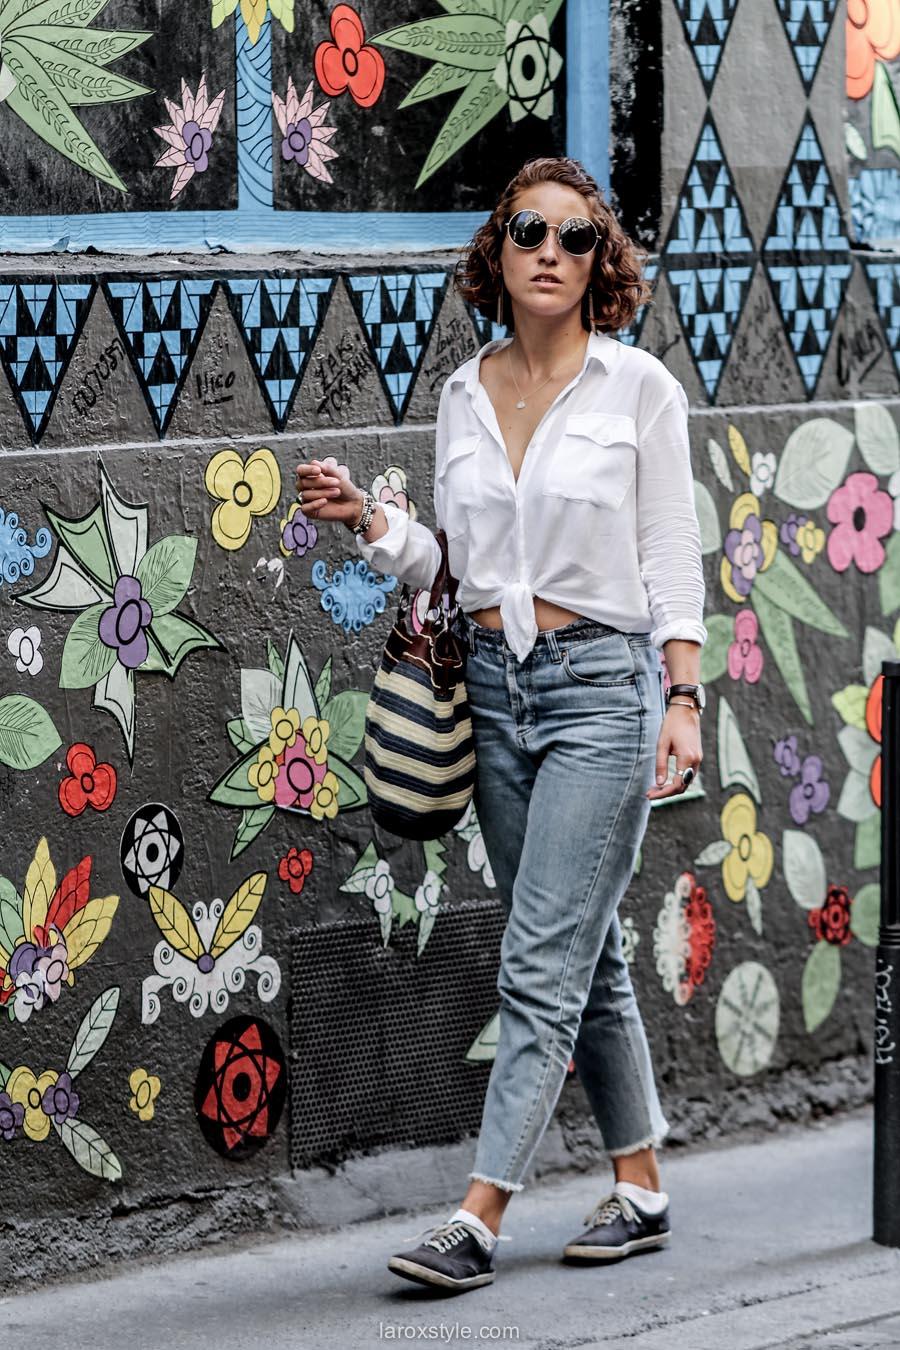 fashion street look - laroxstyle - blog mode lyon